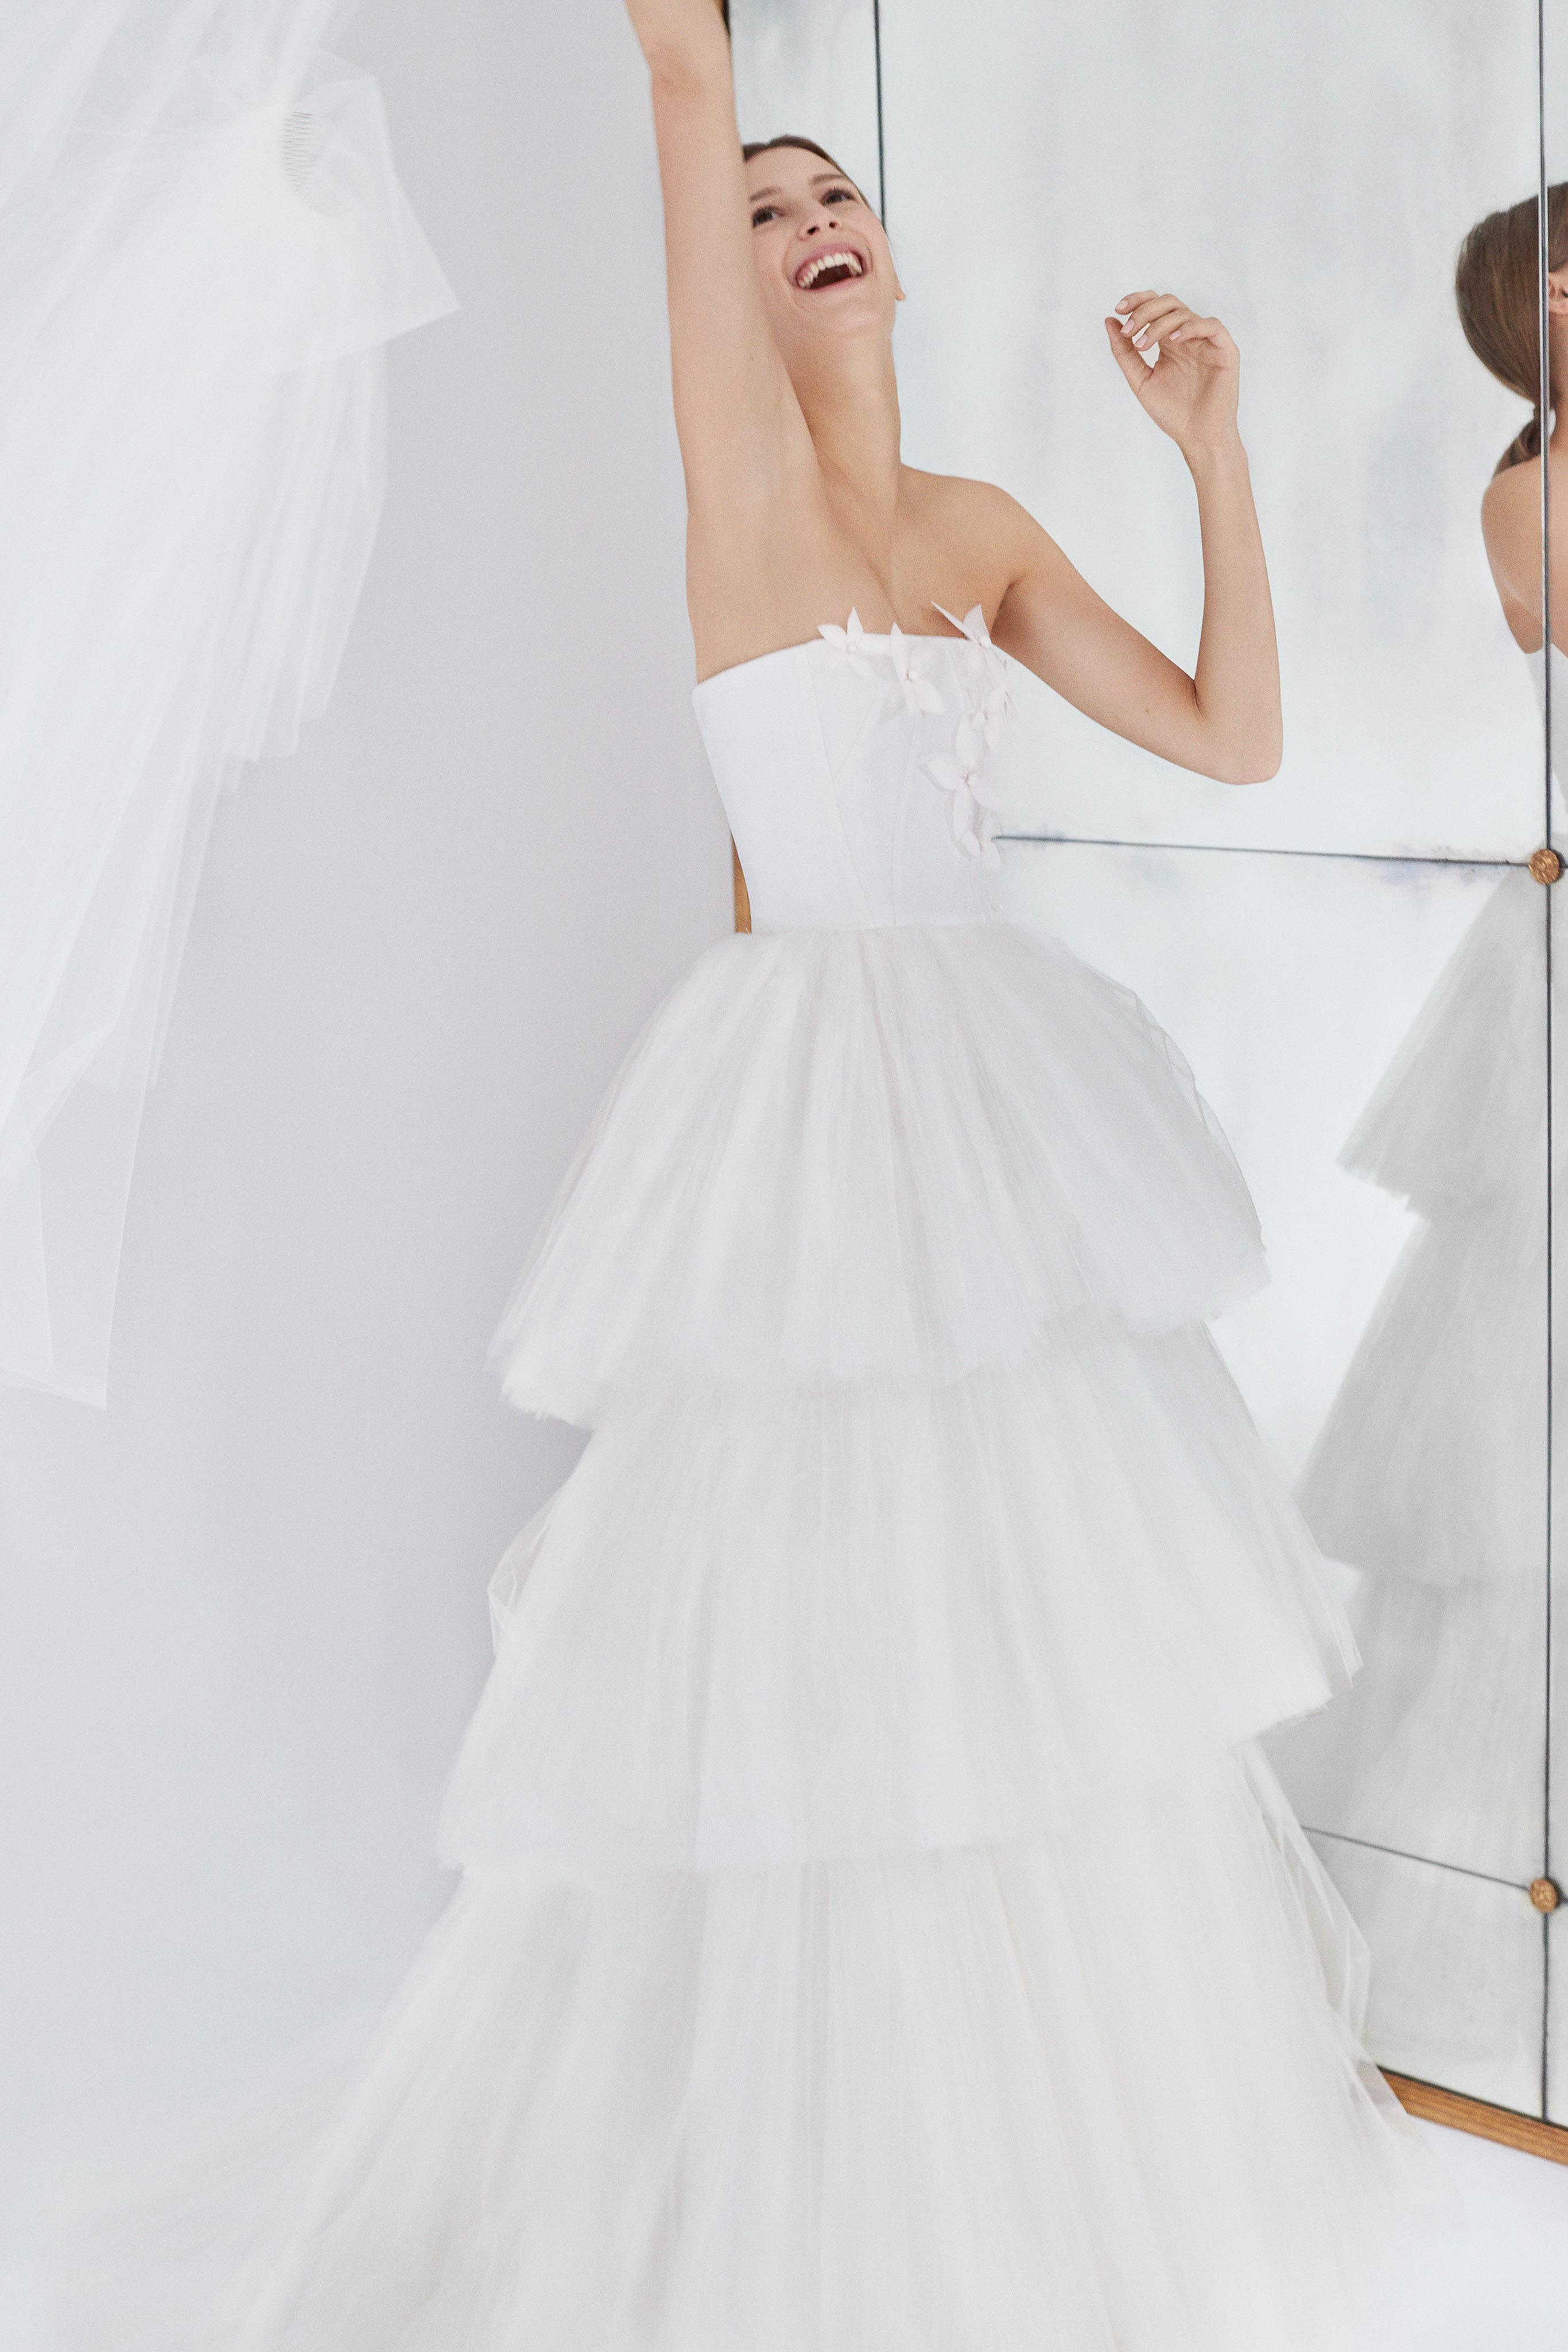 carolina herrera wedding dress fall 2018 tiered tulle strapless